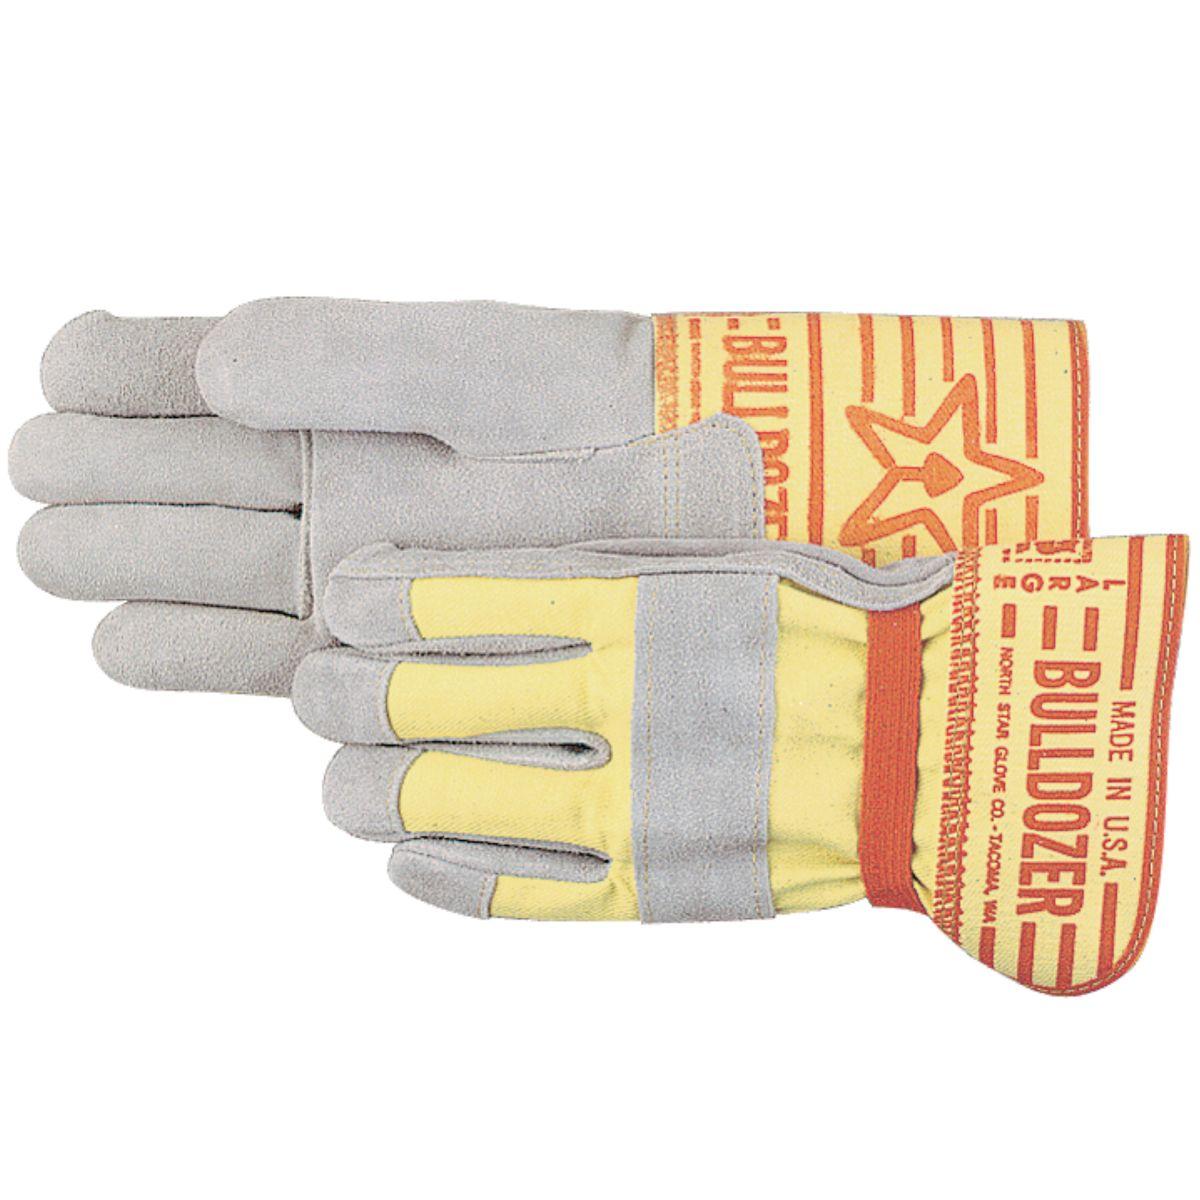 """Bulldozer"" Heavy Duty Leather Gloves"